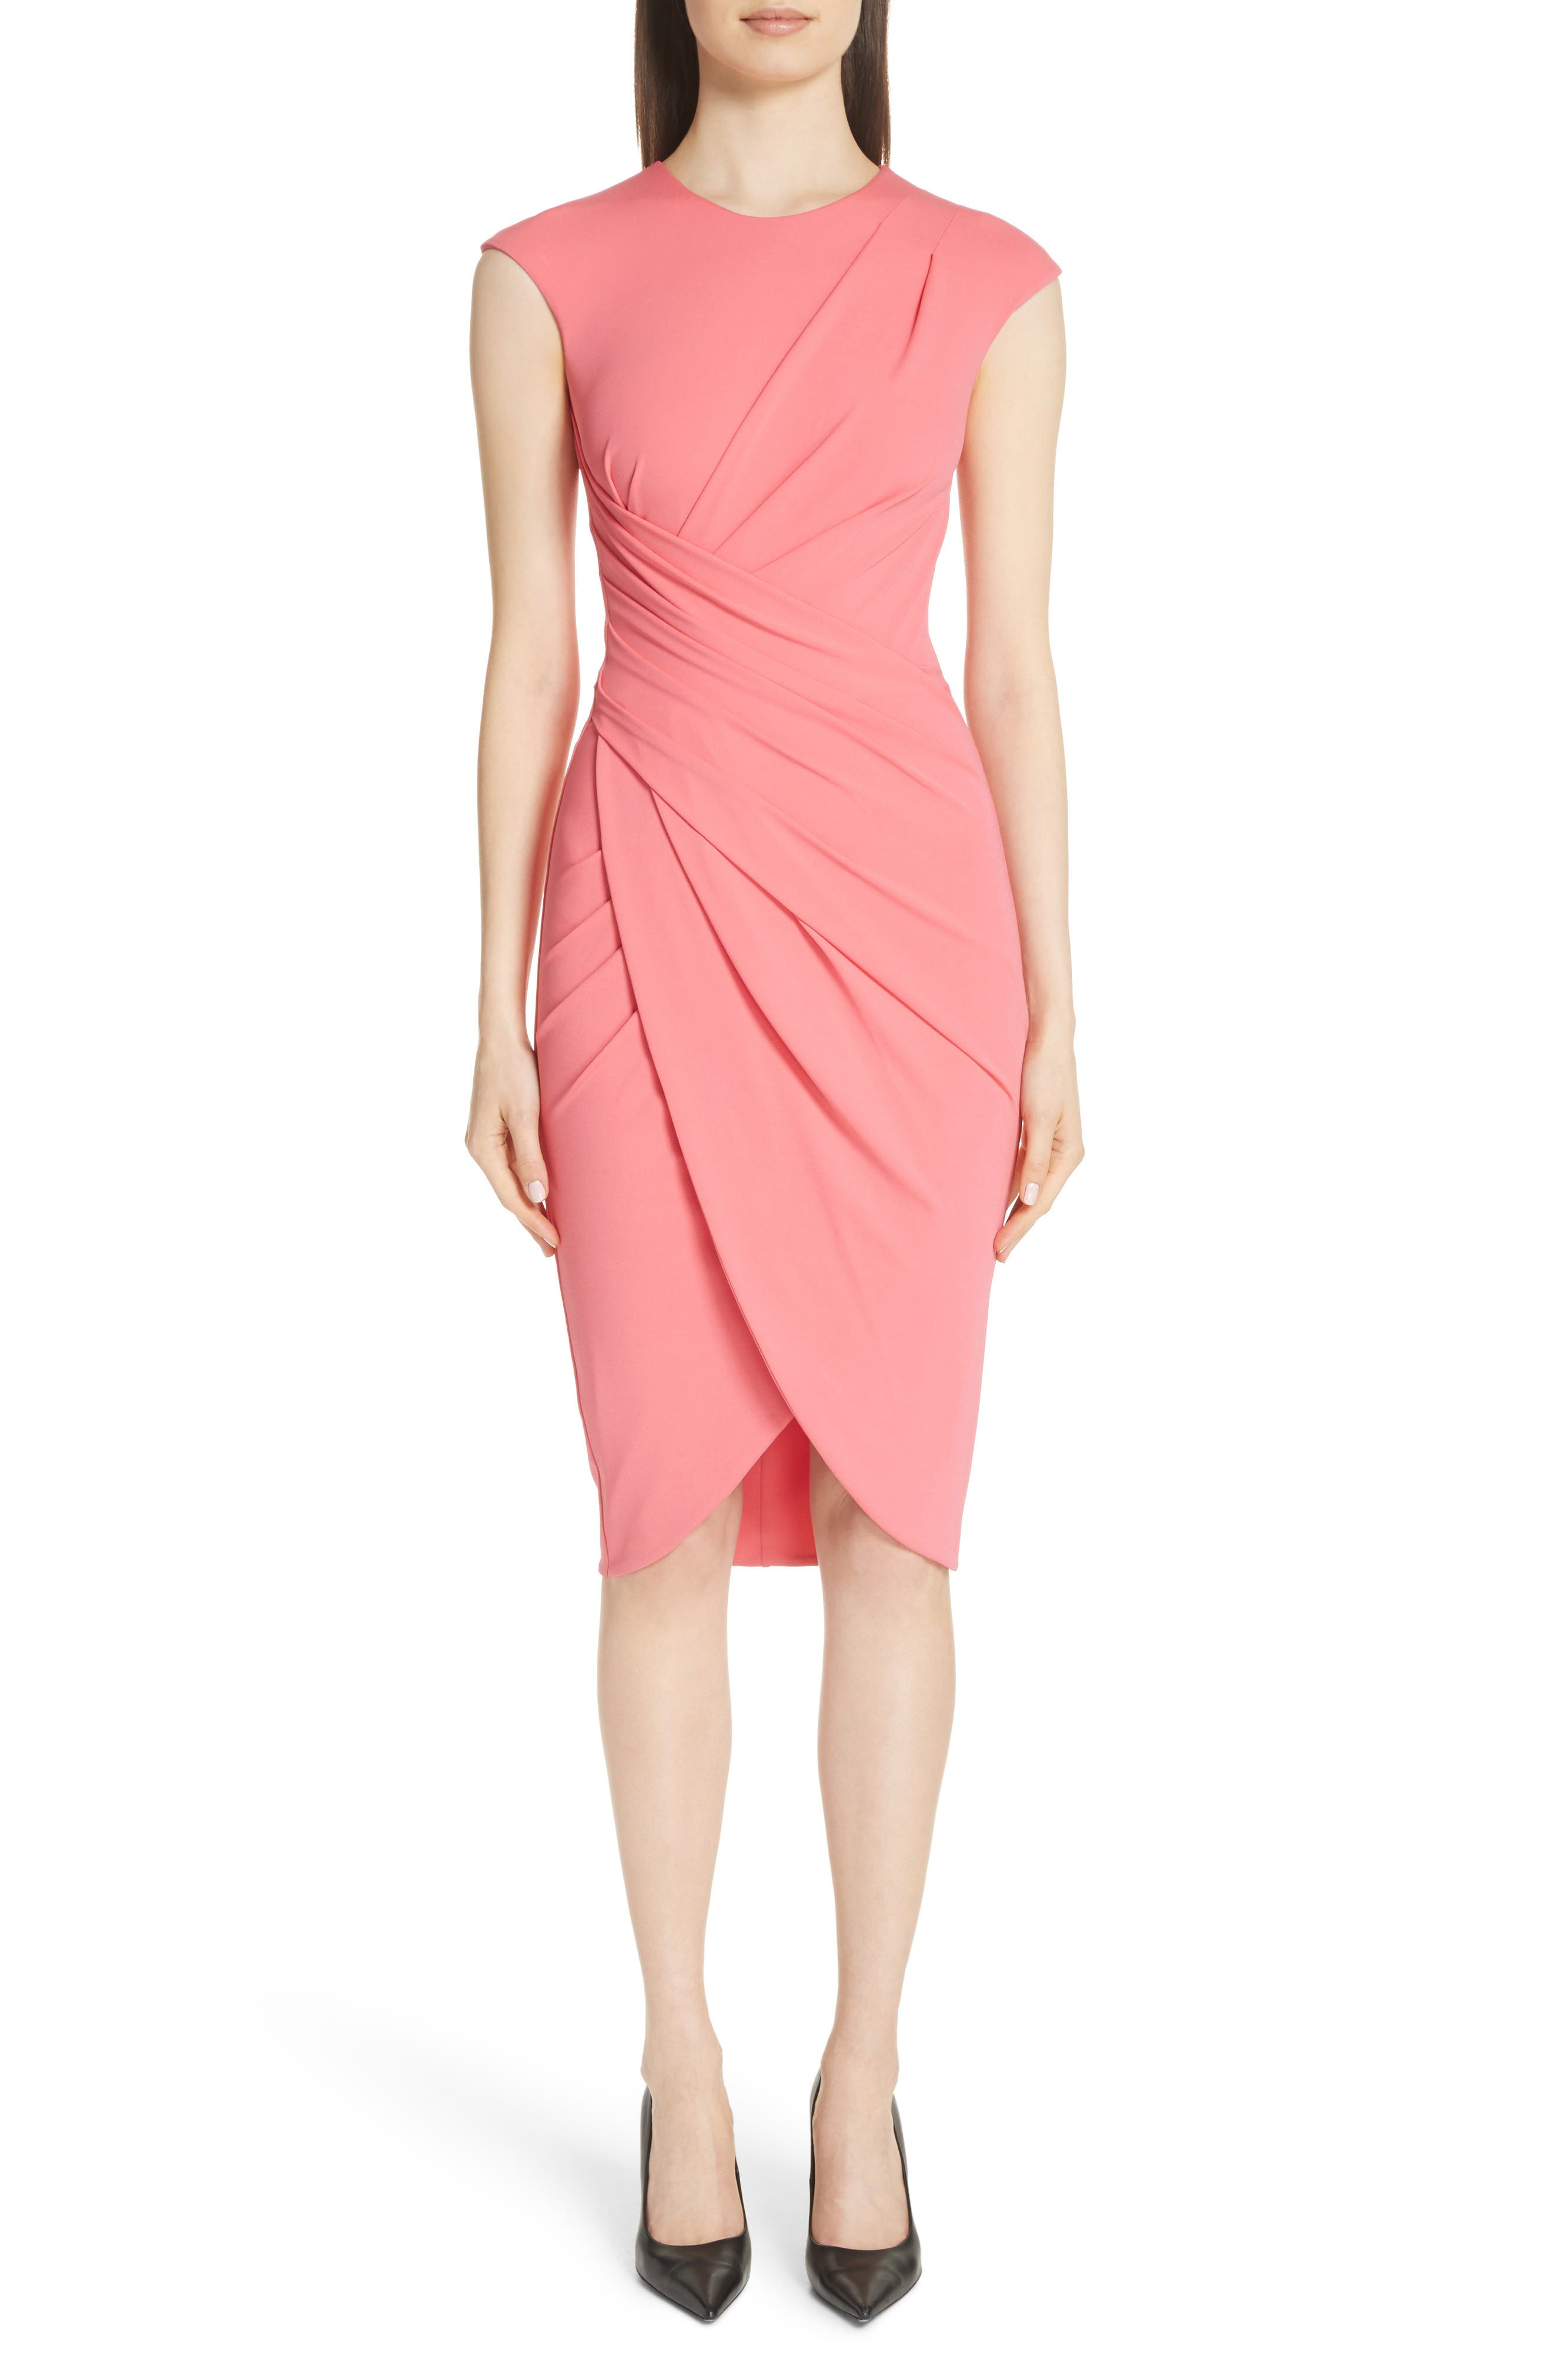 Michael Kors Ruched Tulip Dress